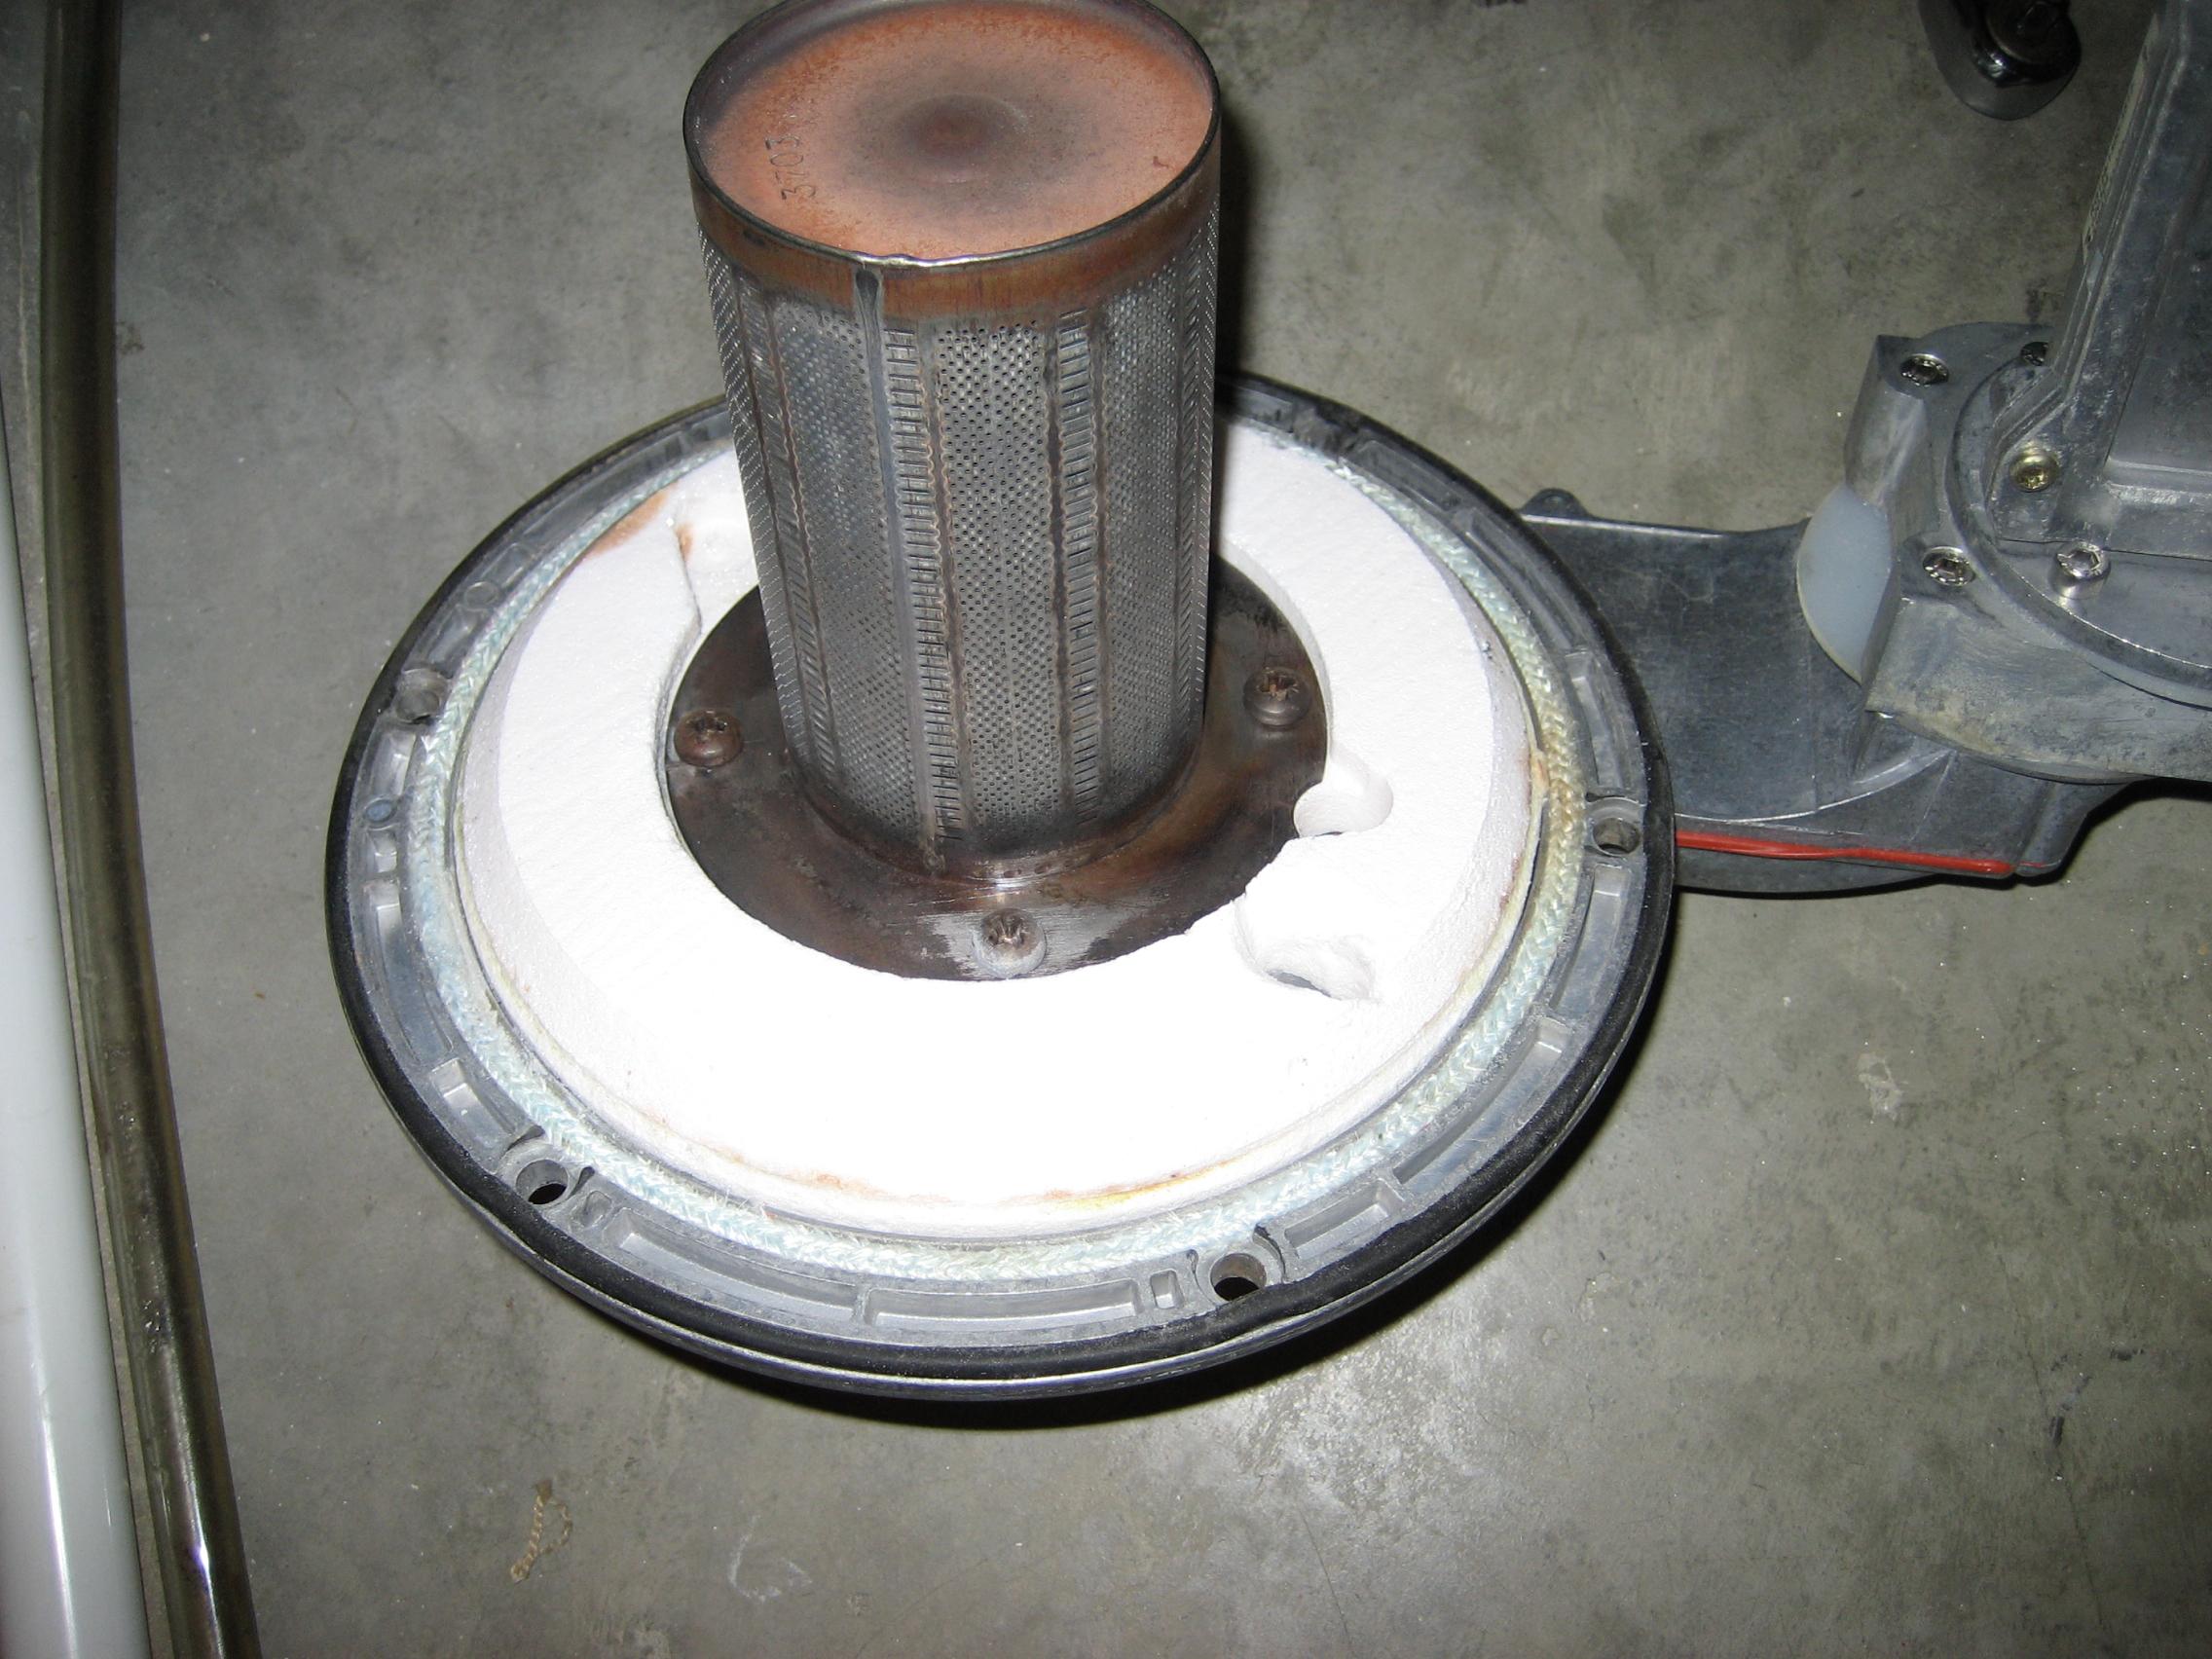 Munchkin 140m Firing Spark Electrode Angle Heating Help The Wall Boiler Wiring Diagram Img 4243